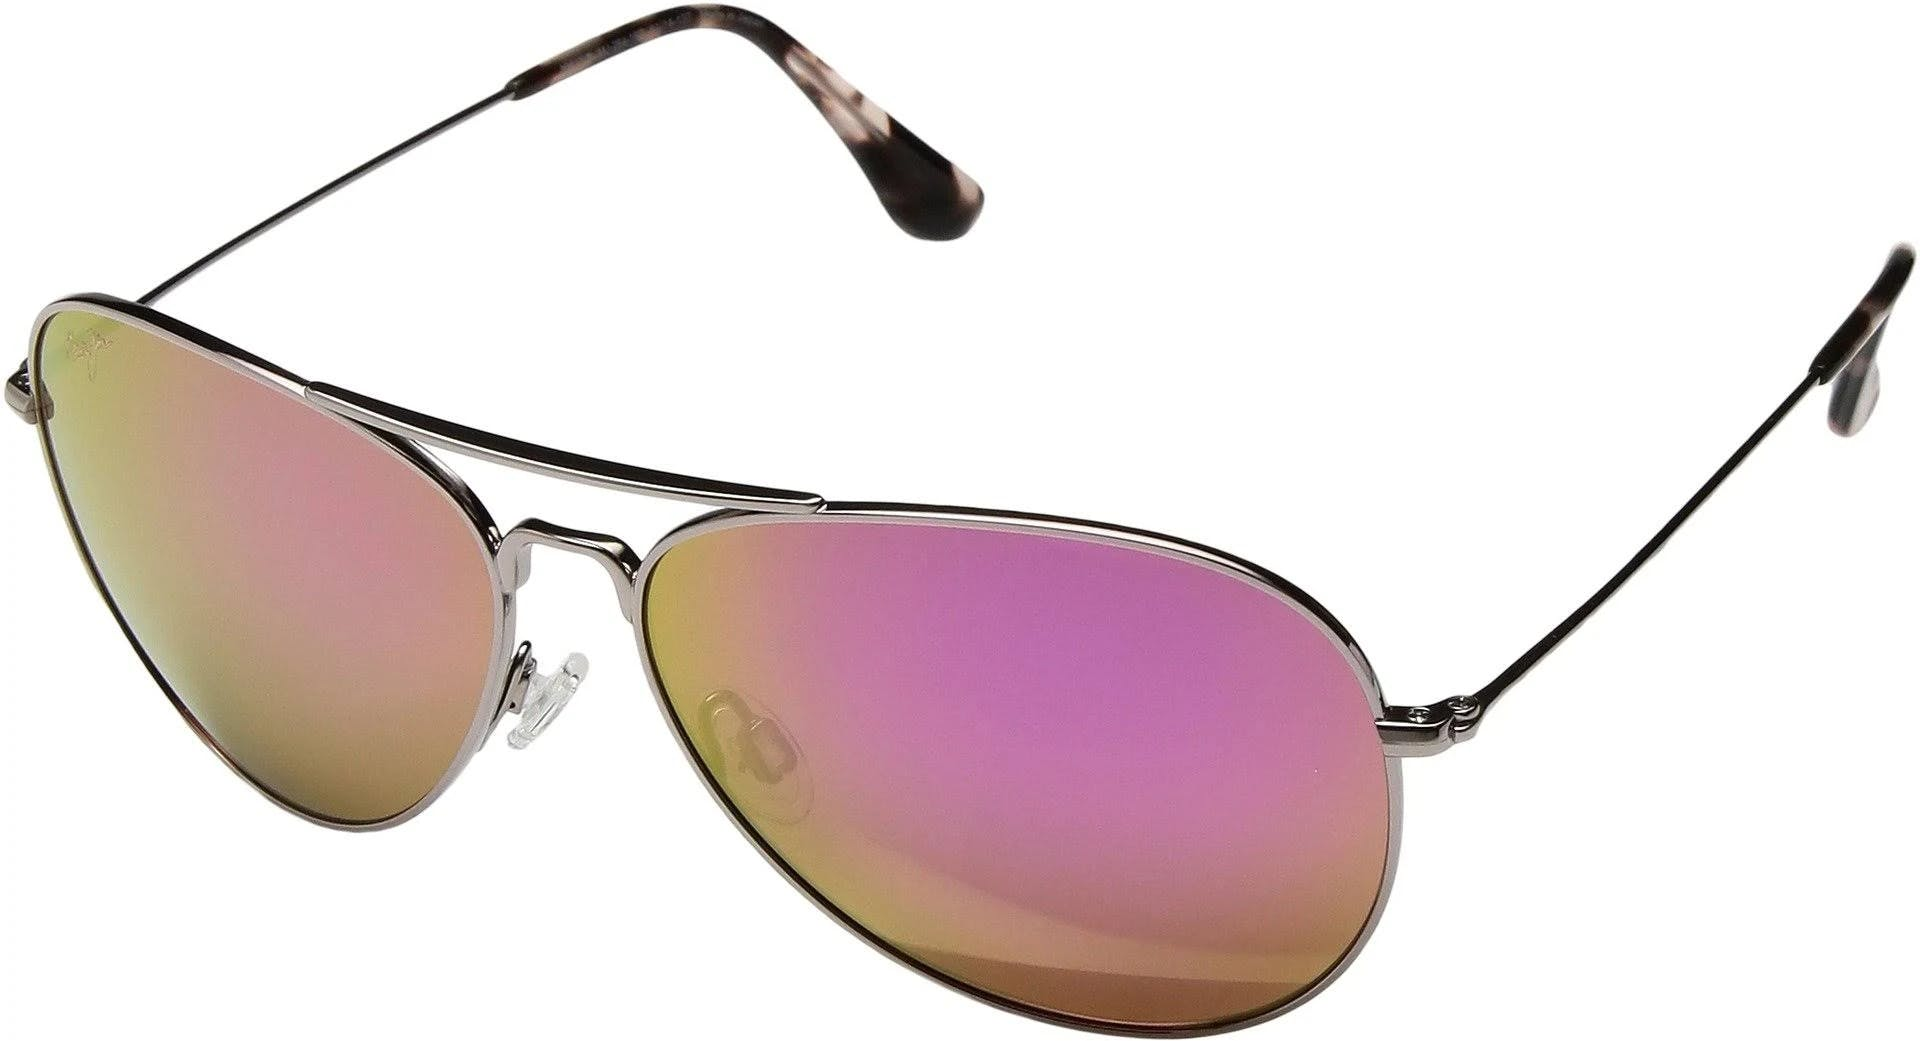 Maui Jim Mavericks Sunglasses Rose Gold / Maui Sunrise